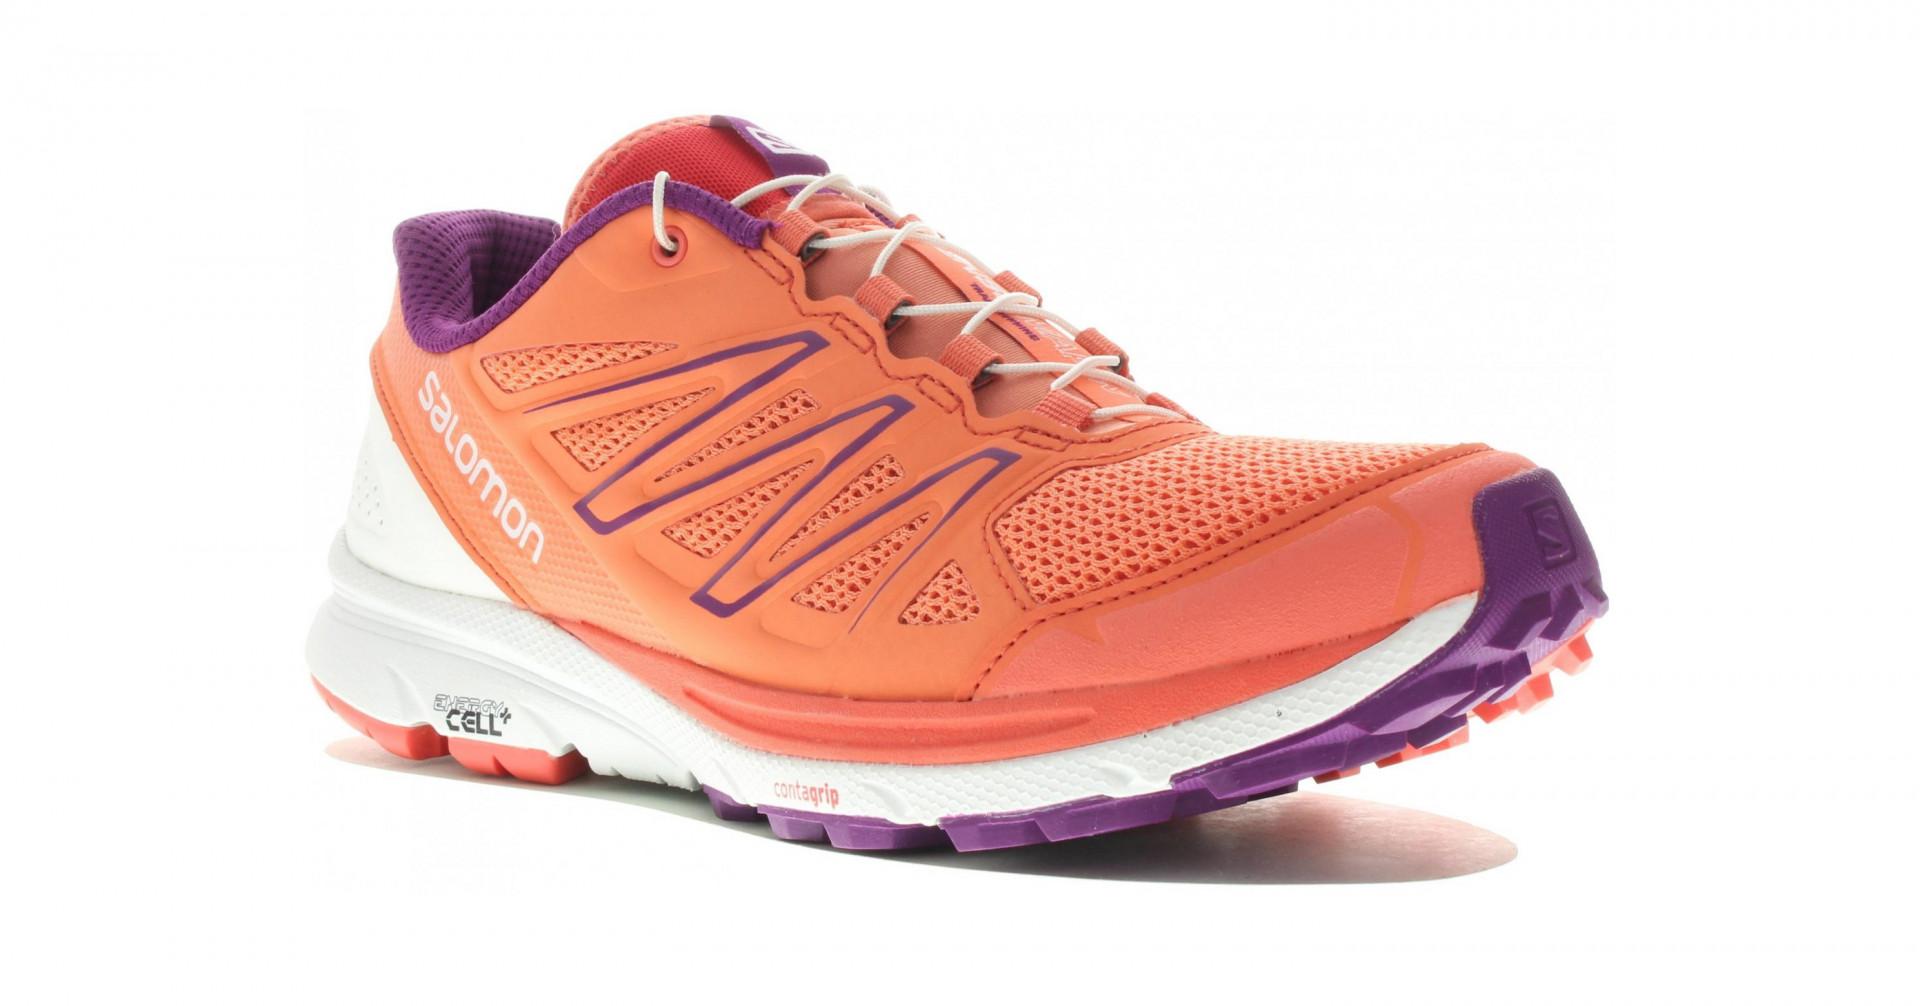 Chaussure de Trail running Salomon sense marin femme